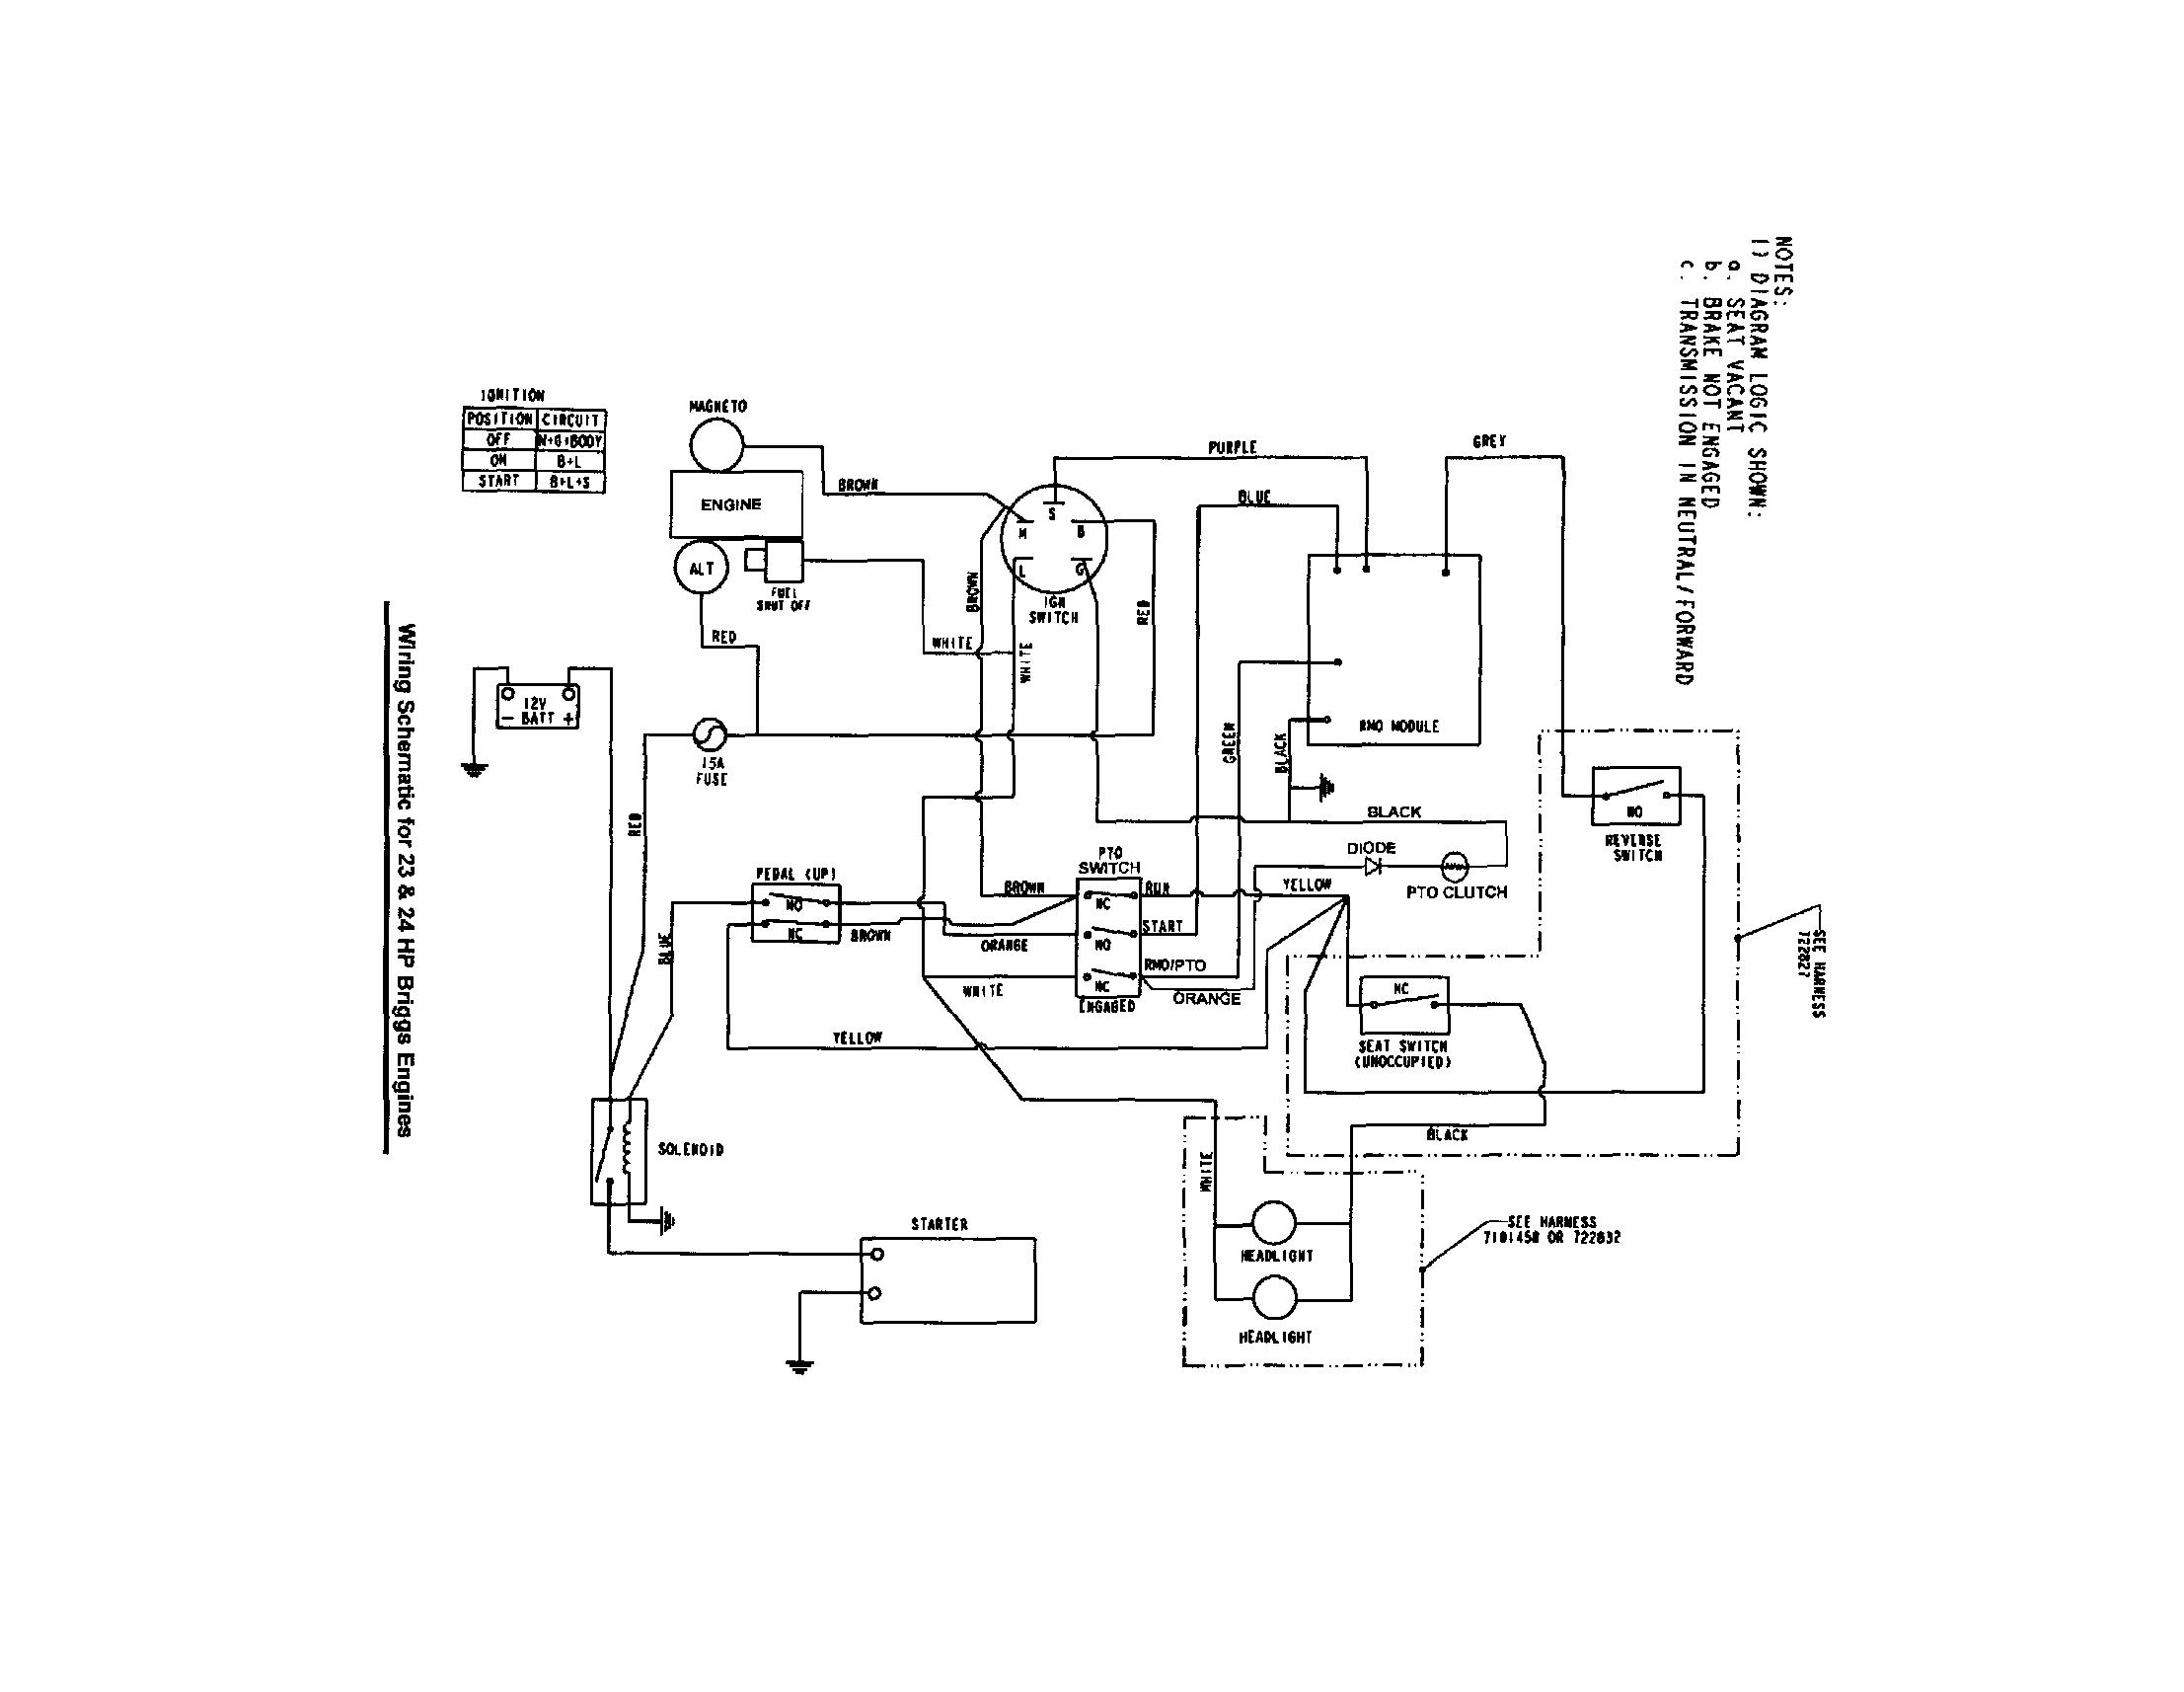 [GJFJ_338]  Snapper Pro Wiring Diagram 3 6 Liter Gm Engine Diagram -  sule.the-damboel-36.florimunt.fr   Lawn Tractor Wiring Schematic      sule.the-damboel-36.florimunt.fr